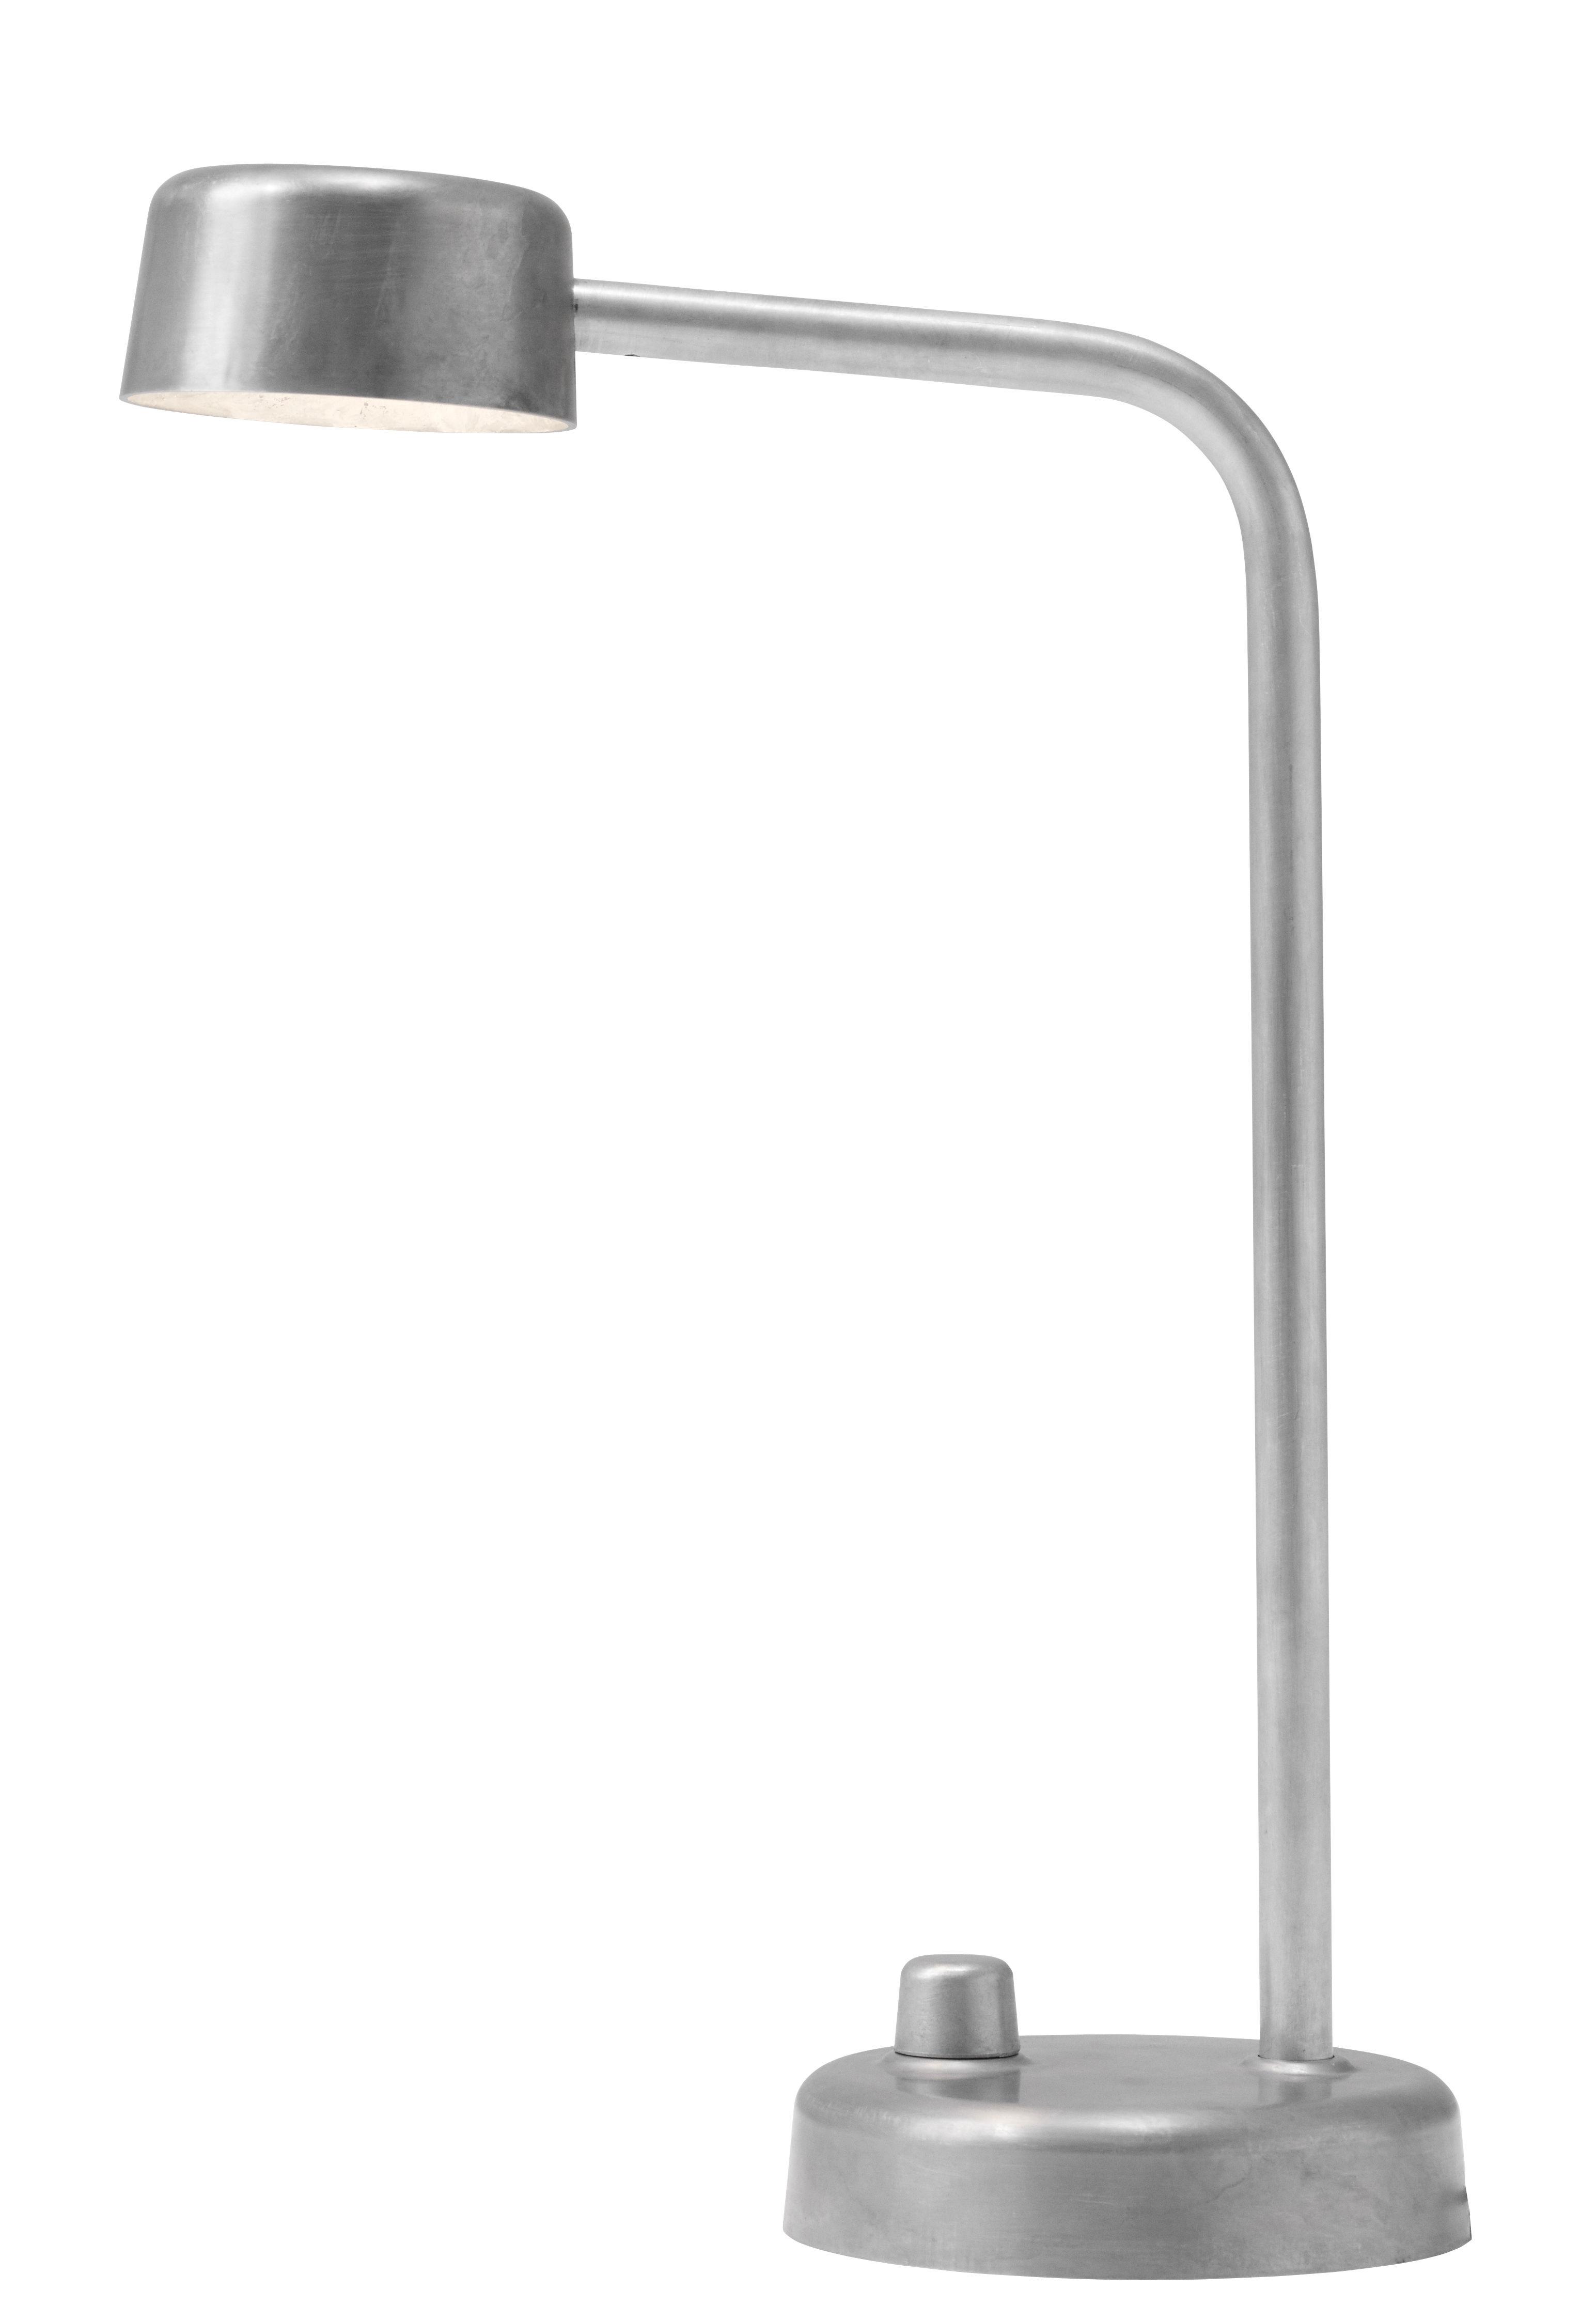 Luminaire - Lampes de table - Lampe de table Working Title / LED - Aluminium - &tradition - Aliminium - Aluminium